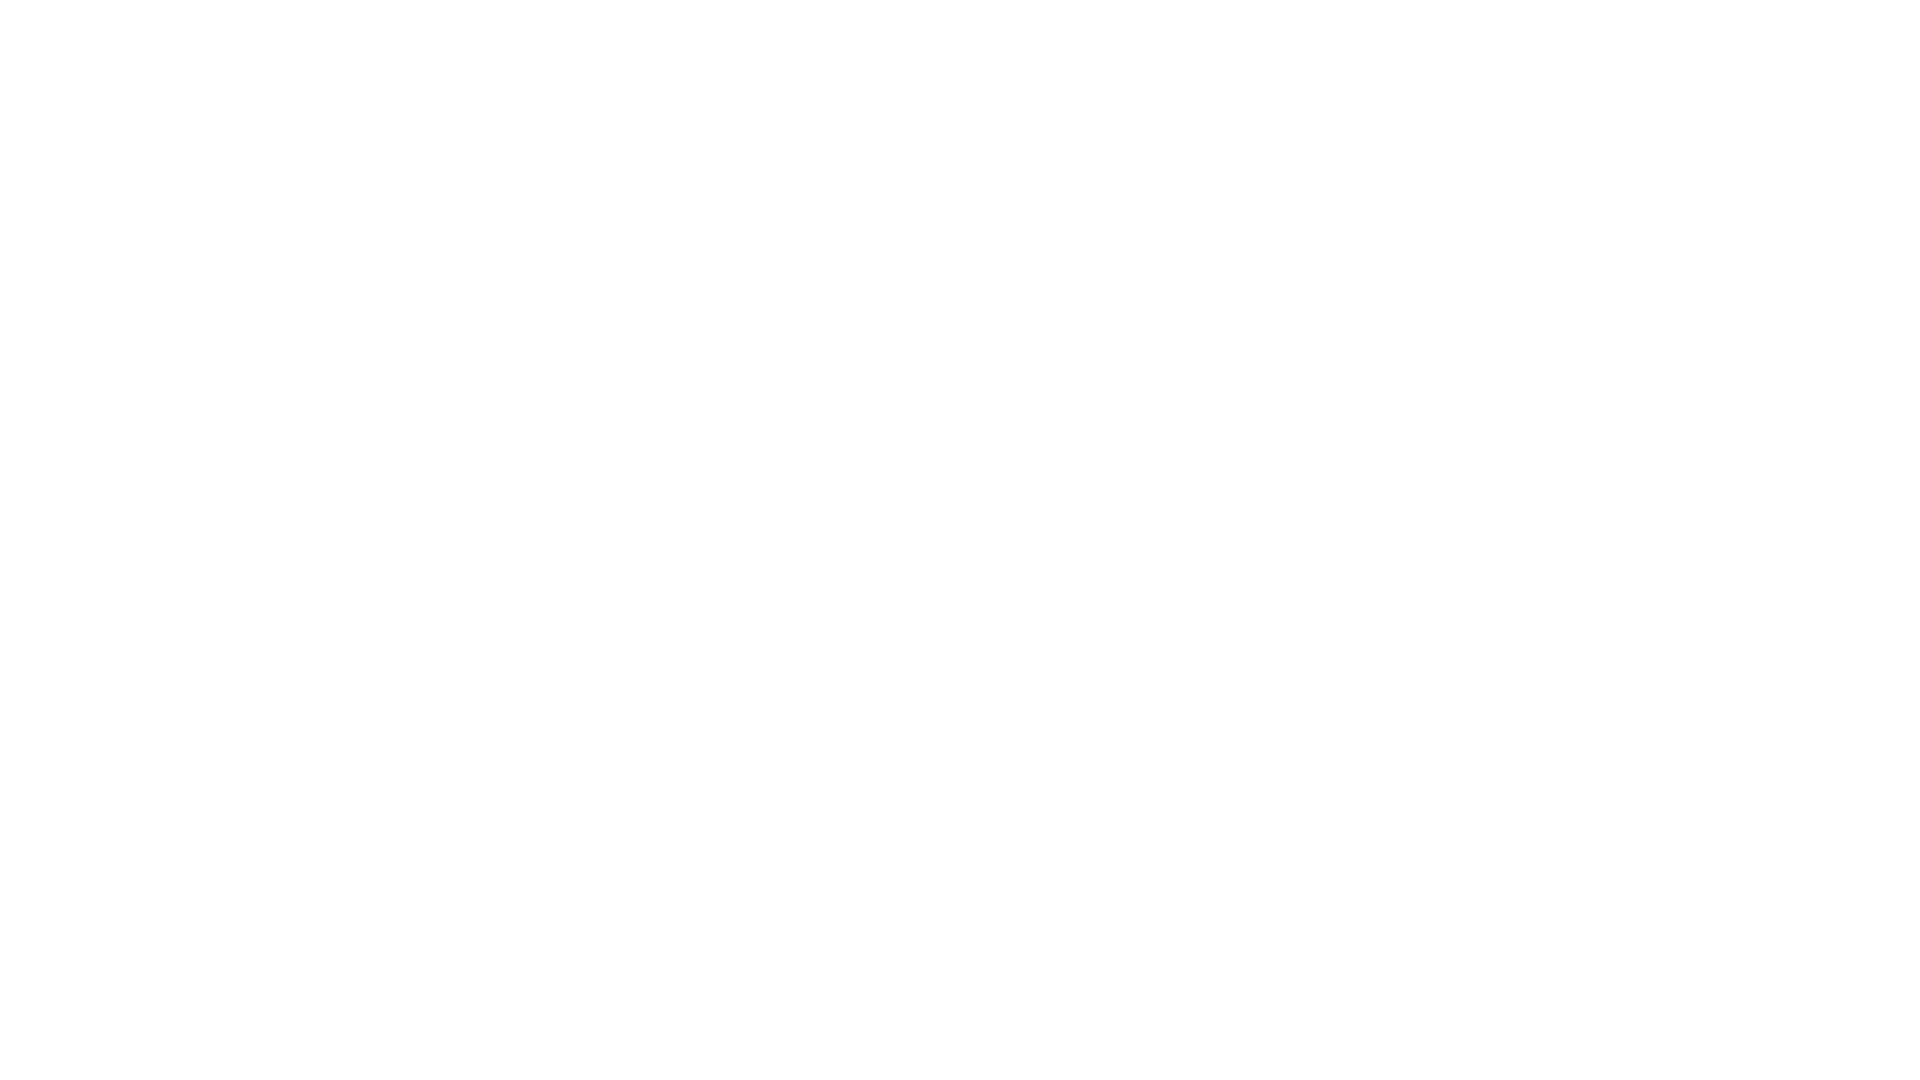 1920x1080_transparent